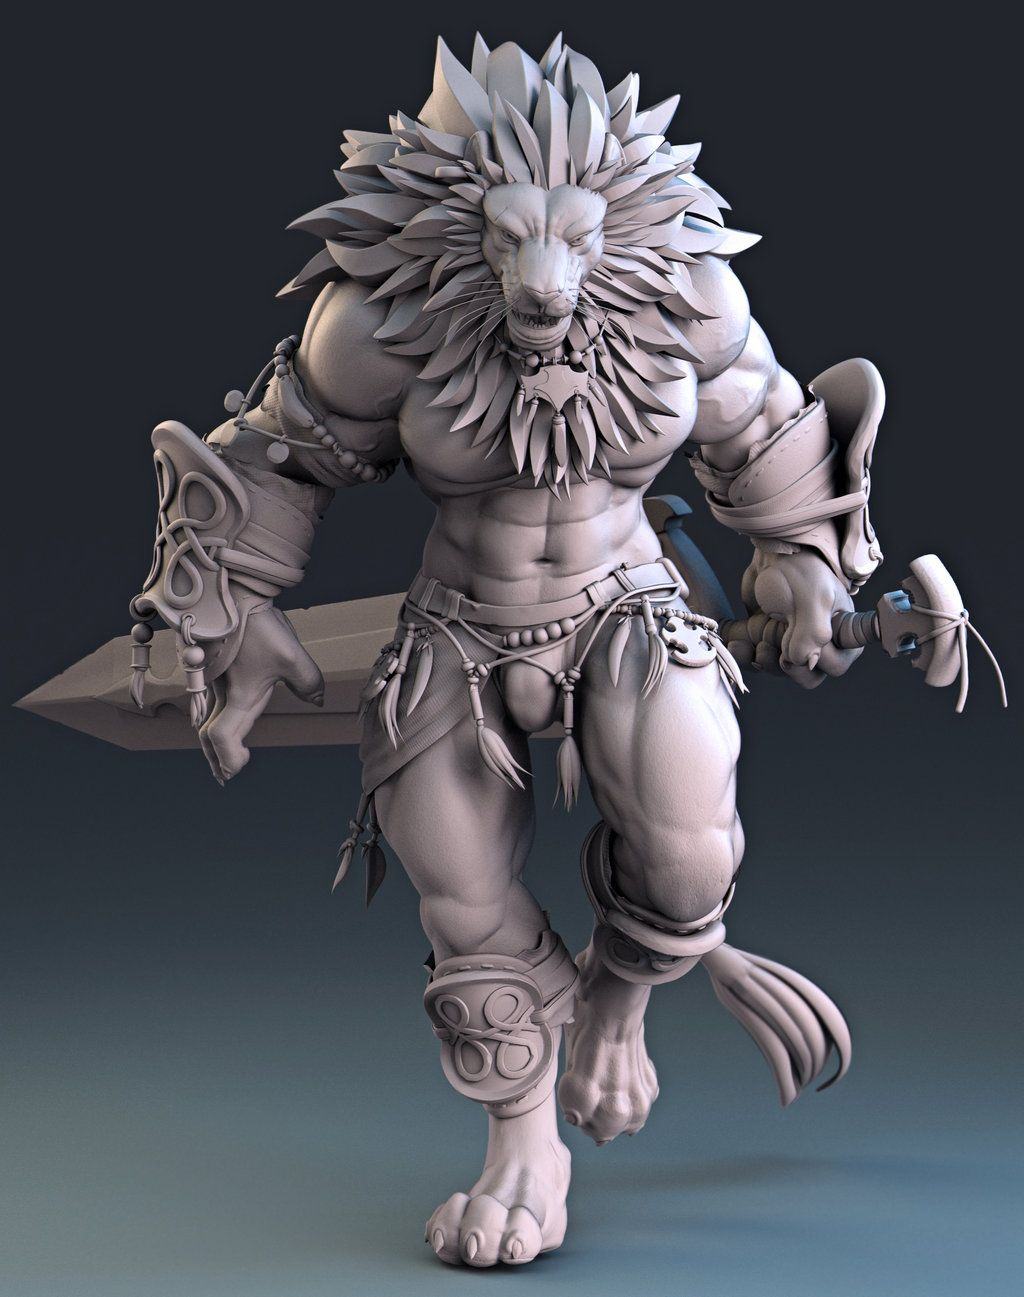 Lion Fighter by NBQuaternion on DeviantArt